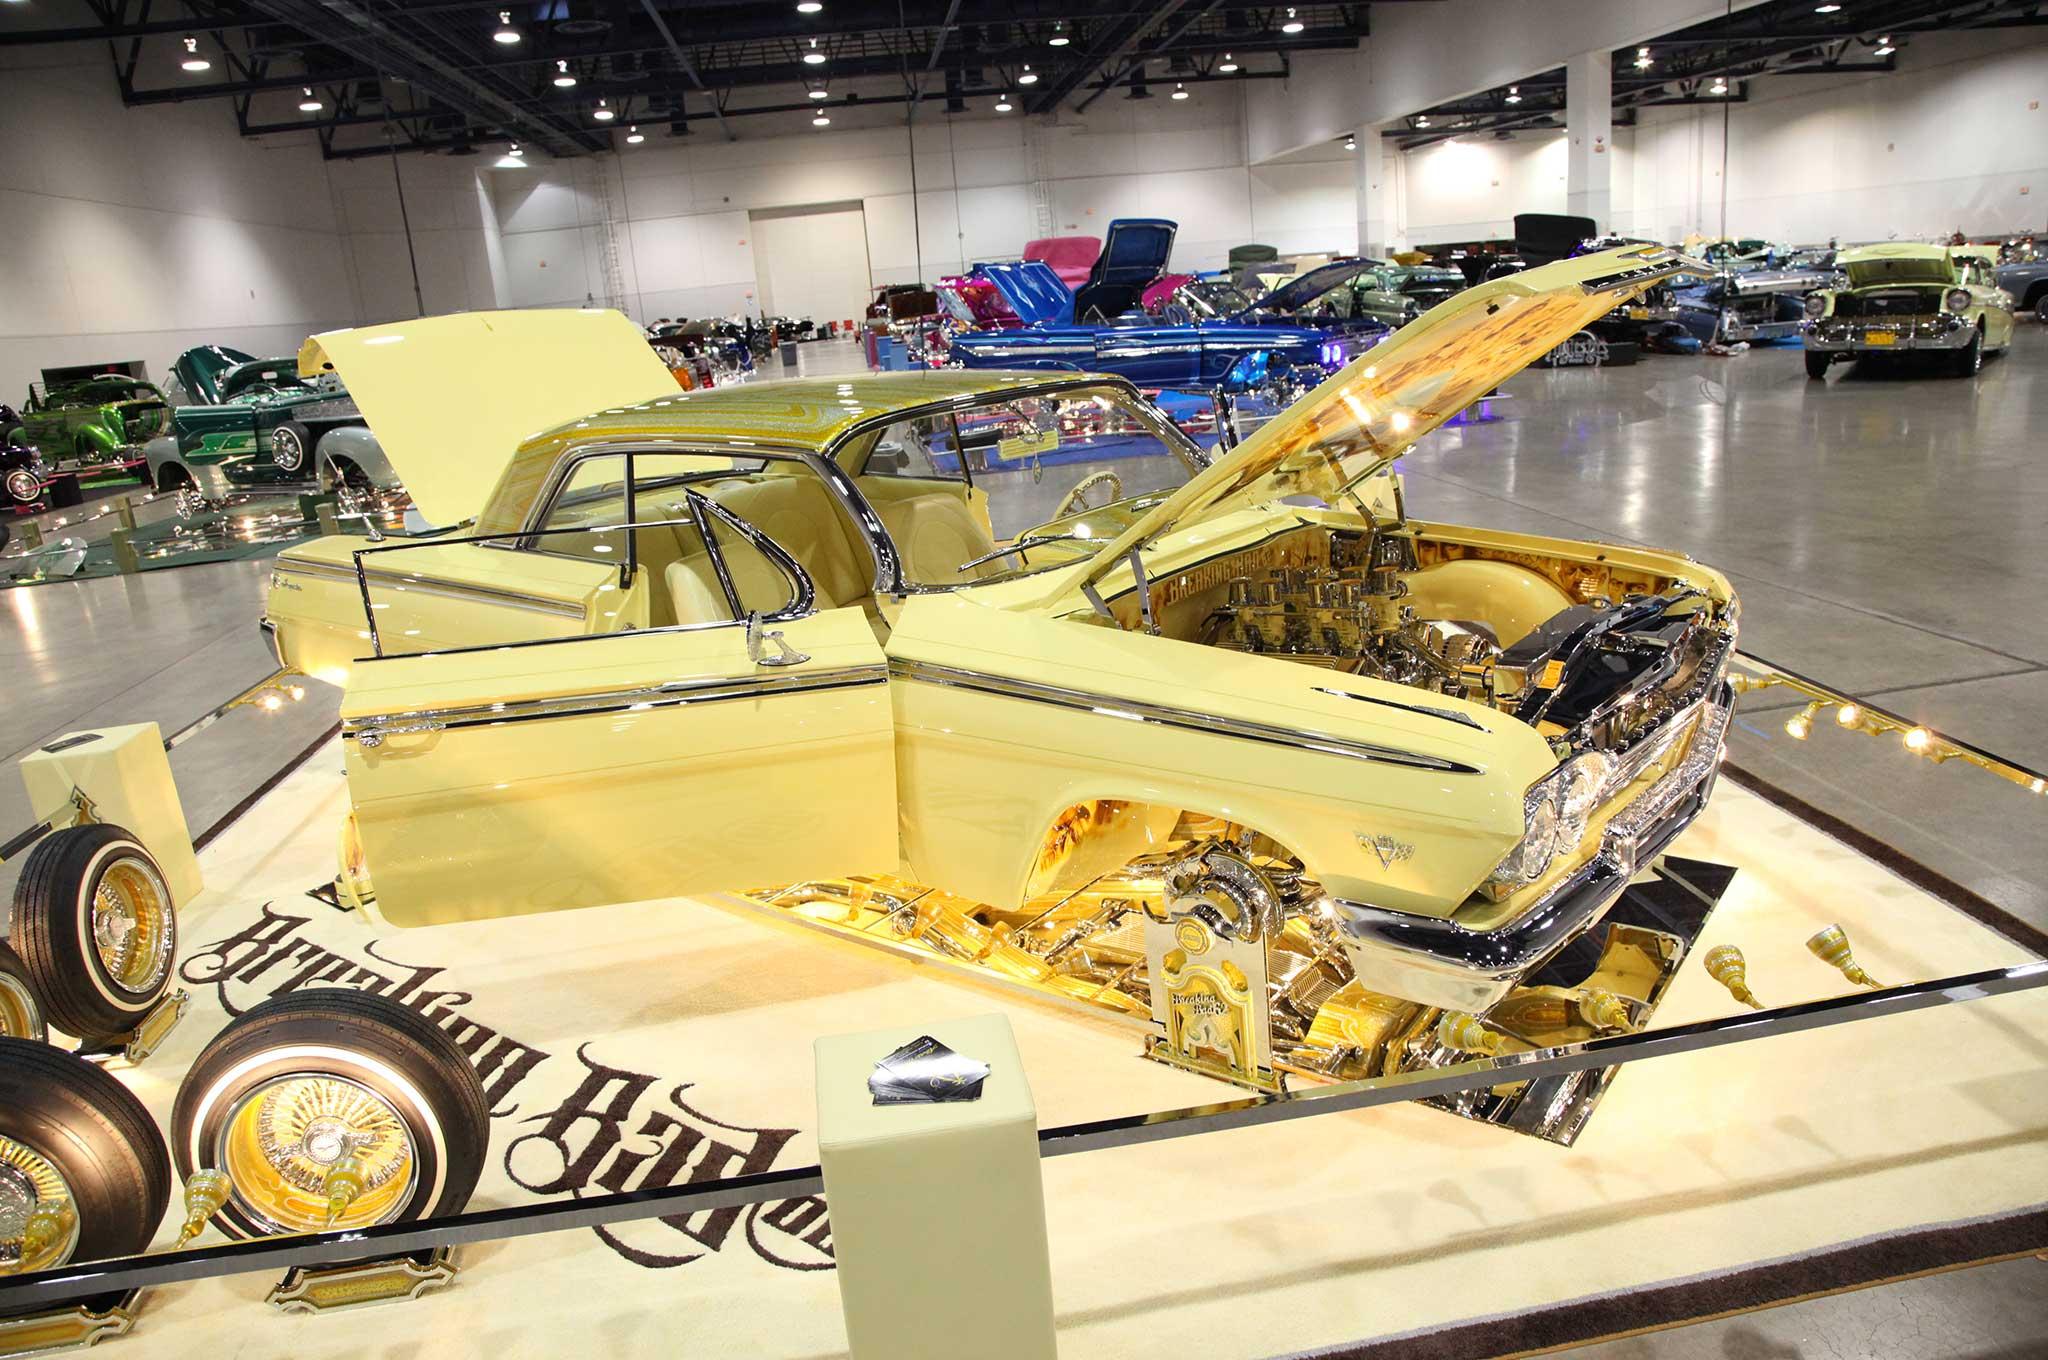 2015-las-vegas-super-show-winners-erik-wisterman-1962-chevy-impala